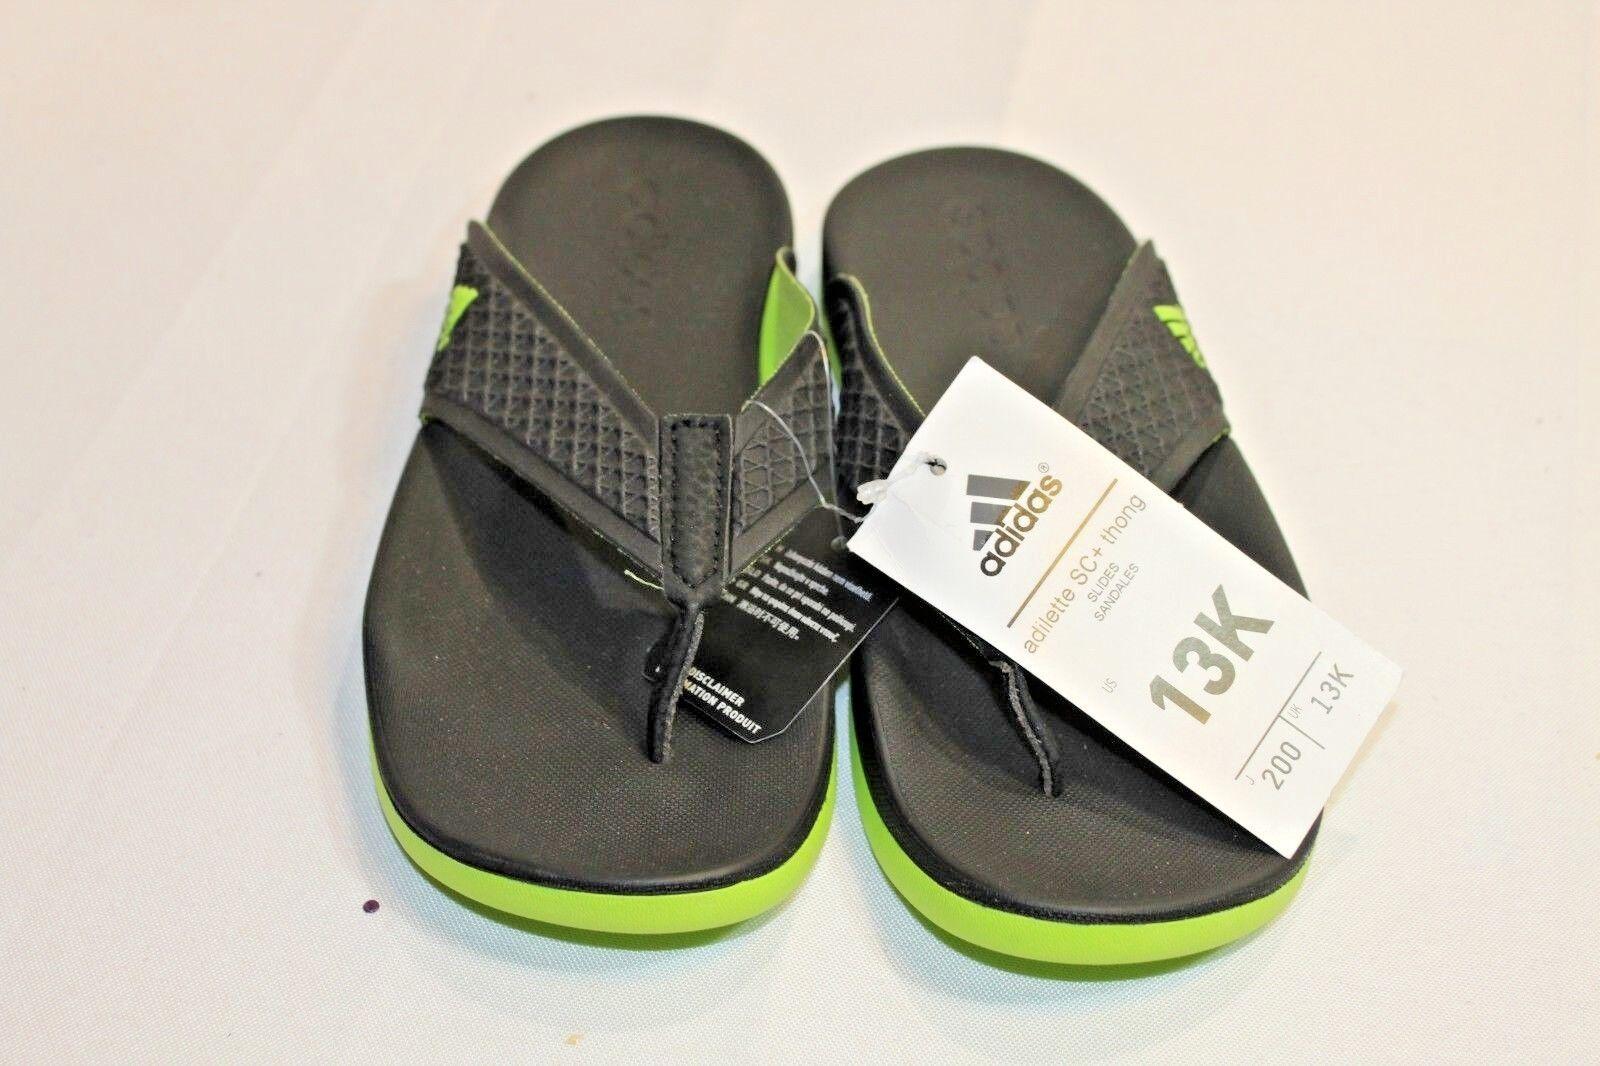 New Boys Adidas Adilette SC+ thong sandals black/green sz 13